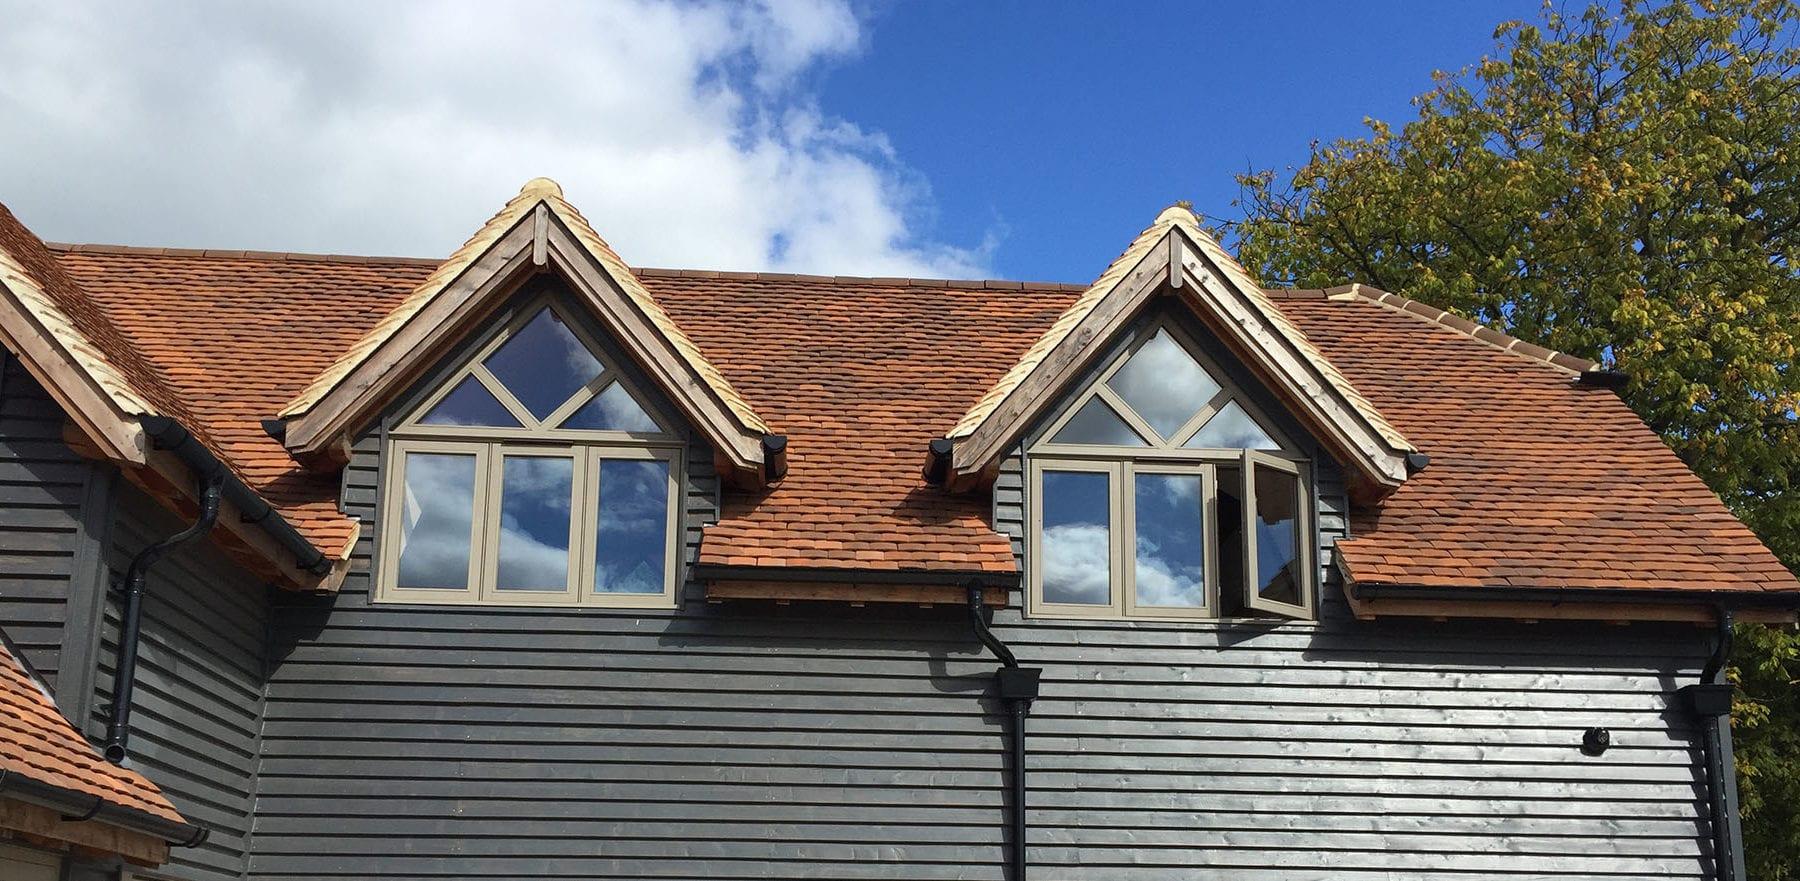 Lifestiles - Handmade Brown Clay Roof Tiles - Midgham, England 3